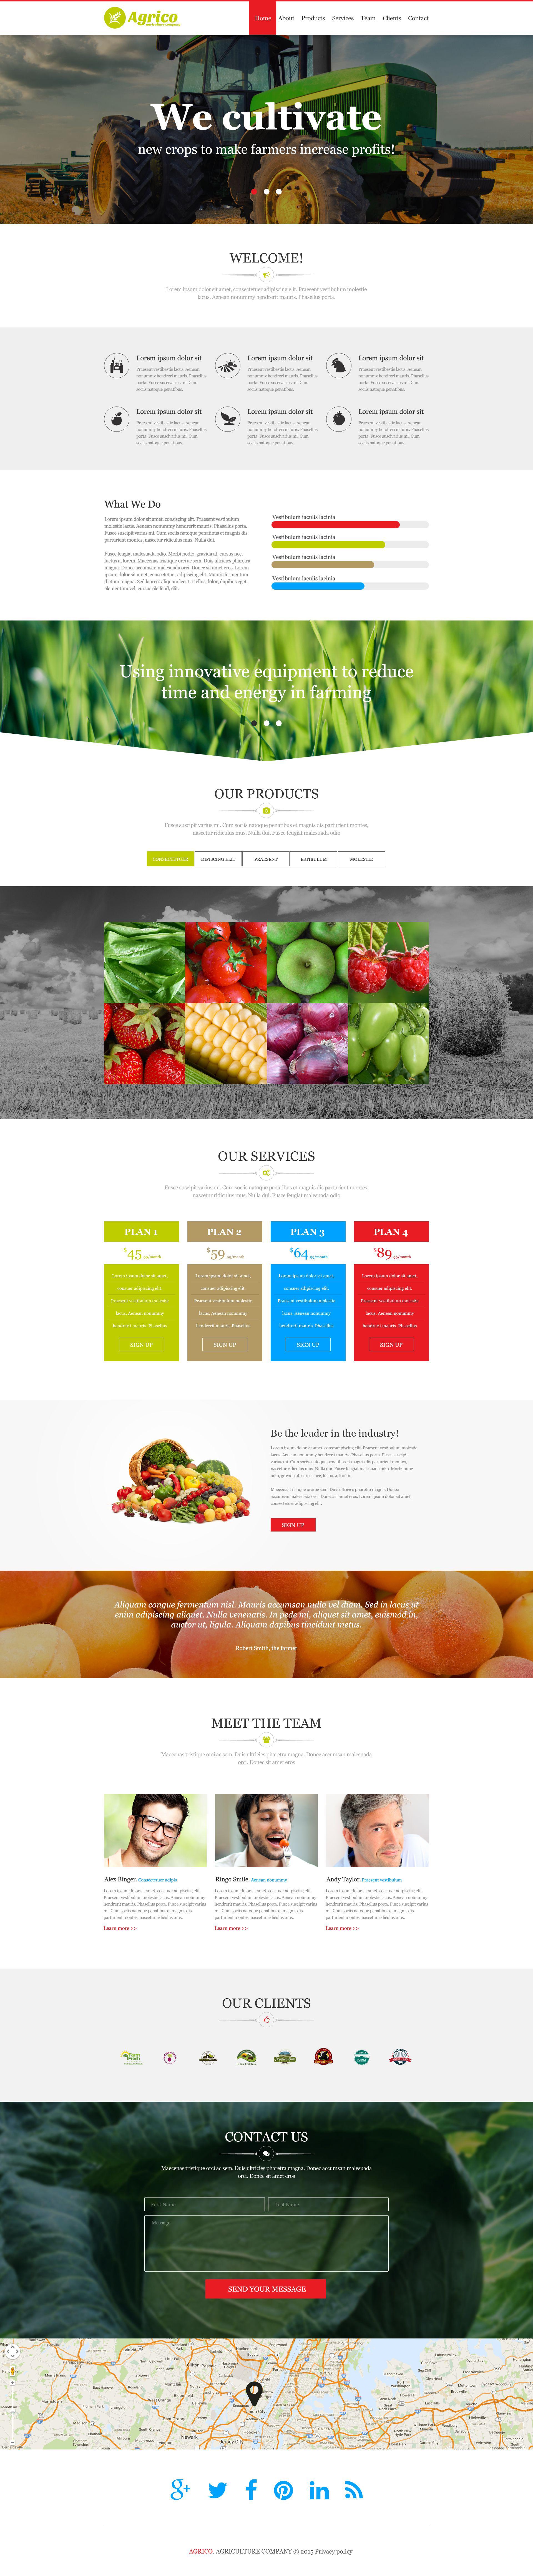 Szablon Muse #52629 na temat: rolnictwo - zrzut ekranu